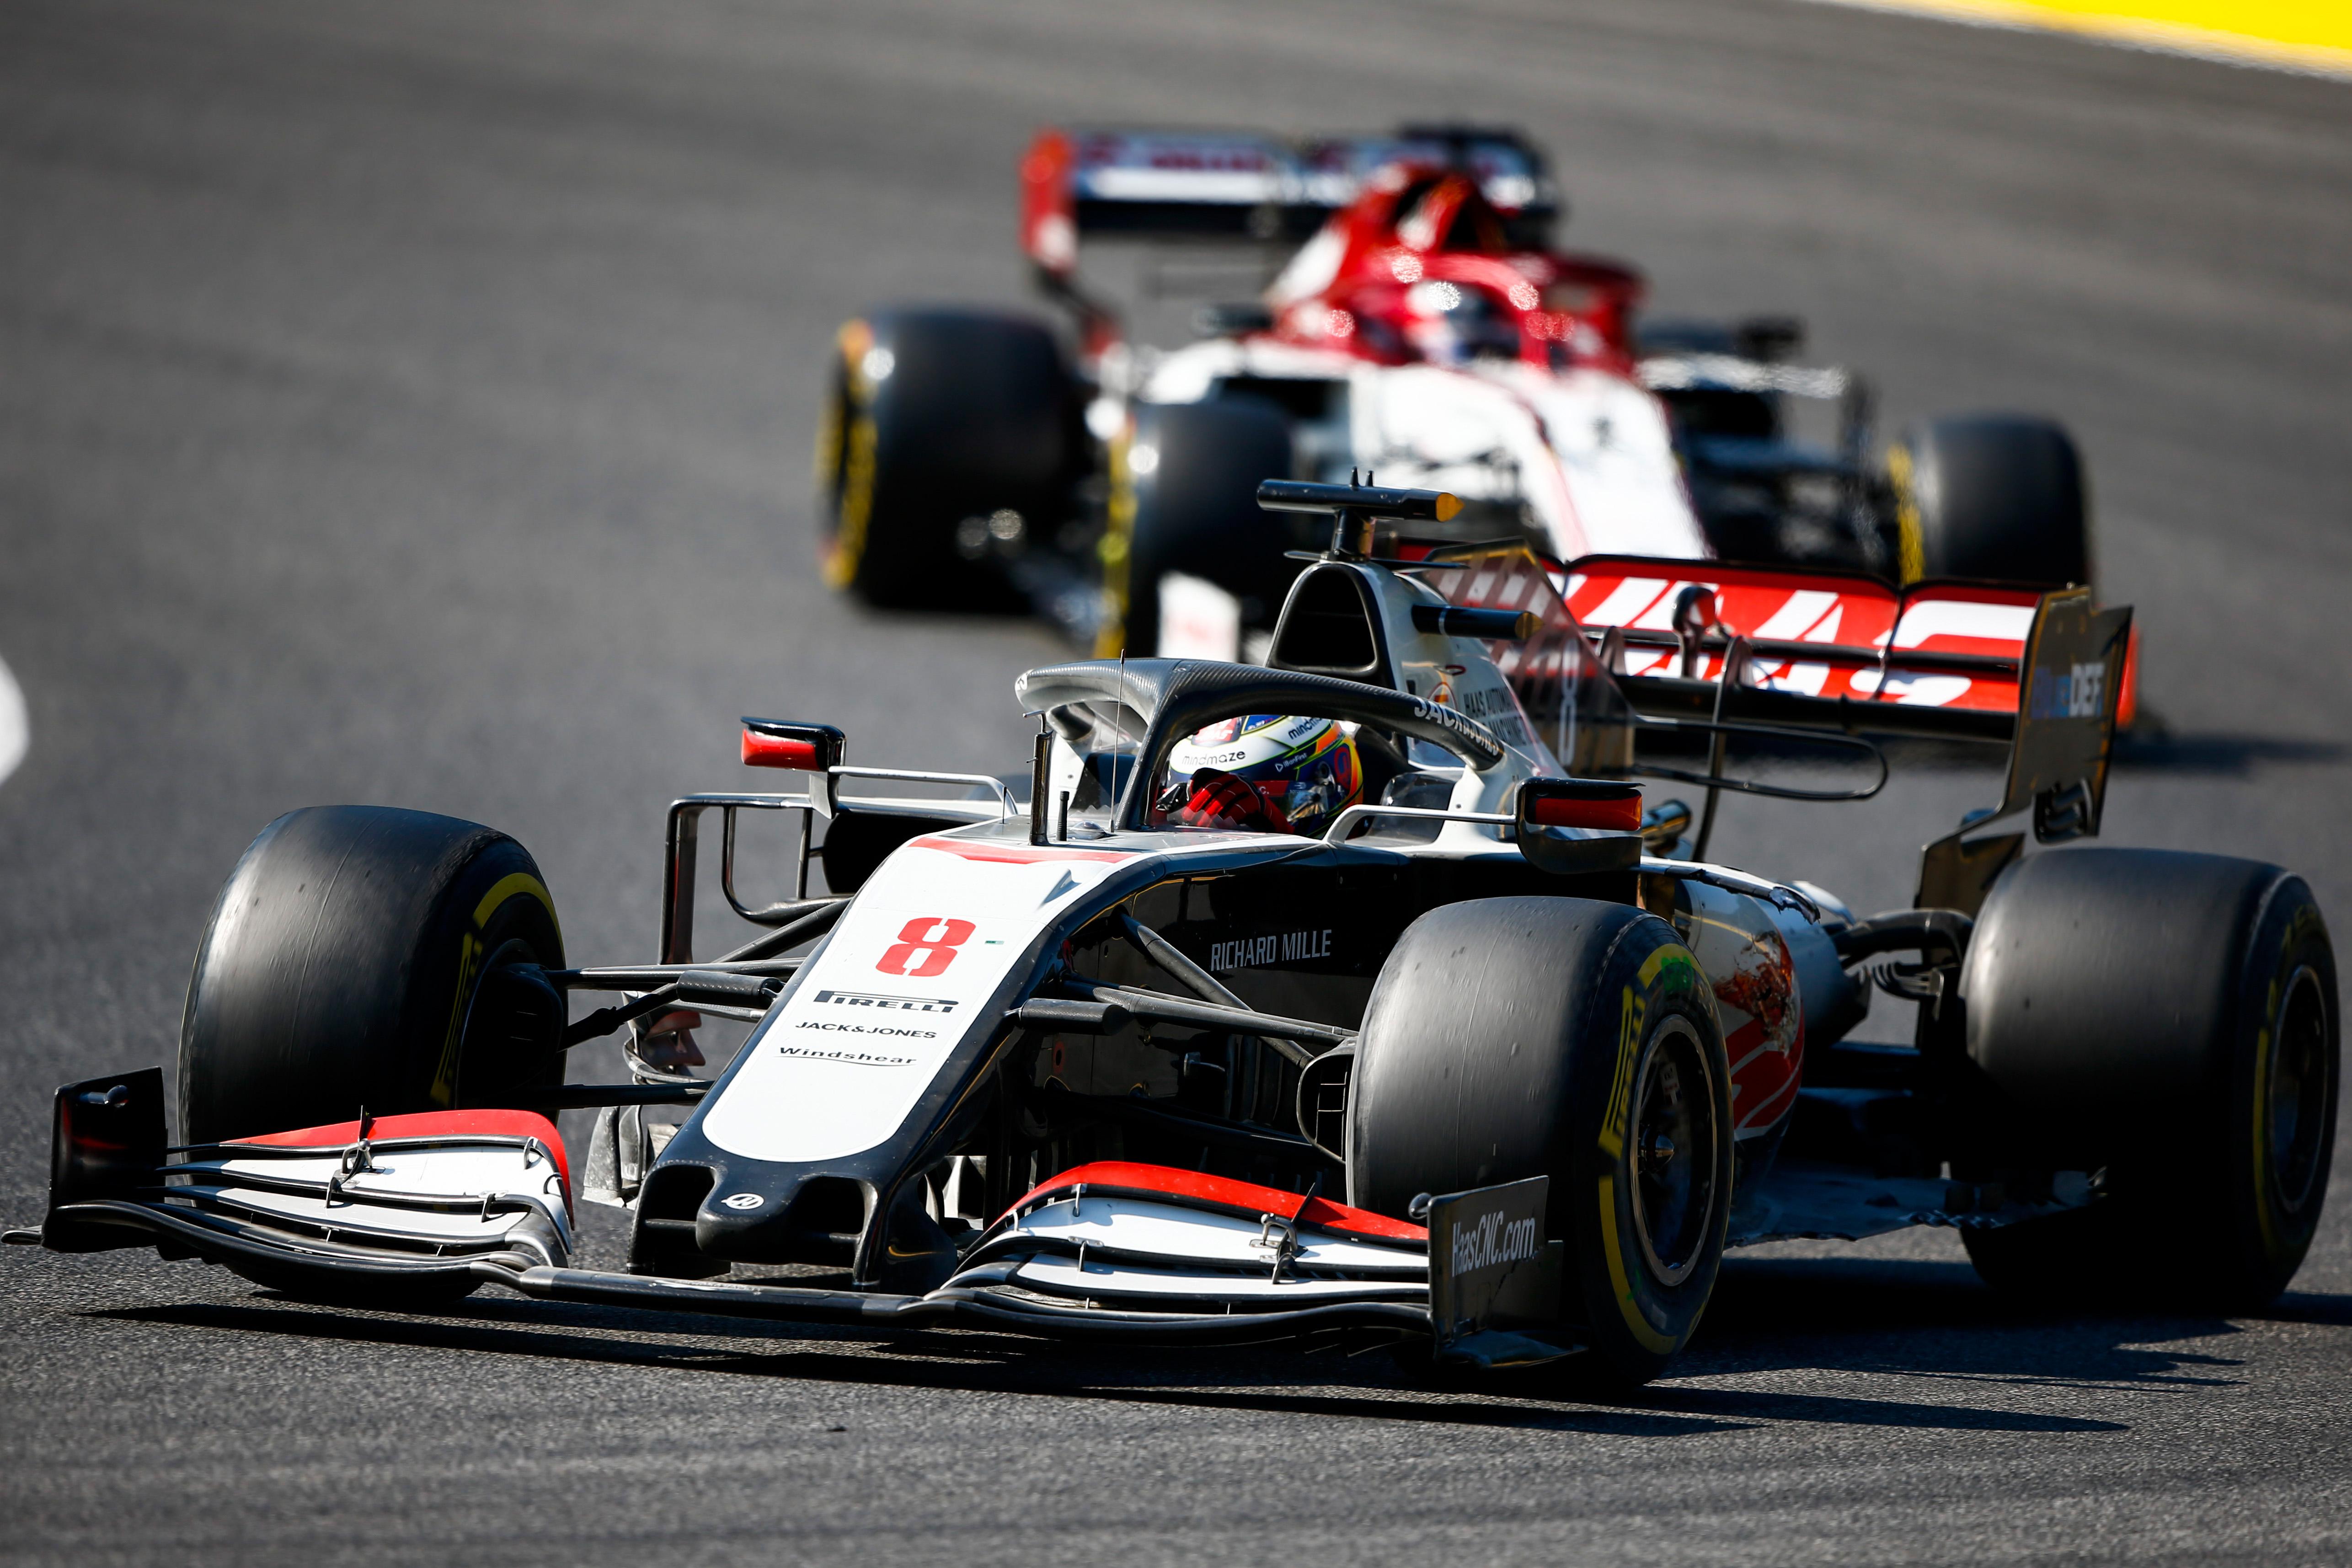 Romain Grosjean Haas Tuscan Grand Prix 2020 Mugello